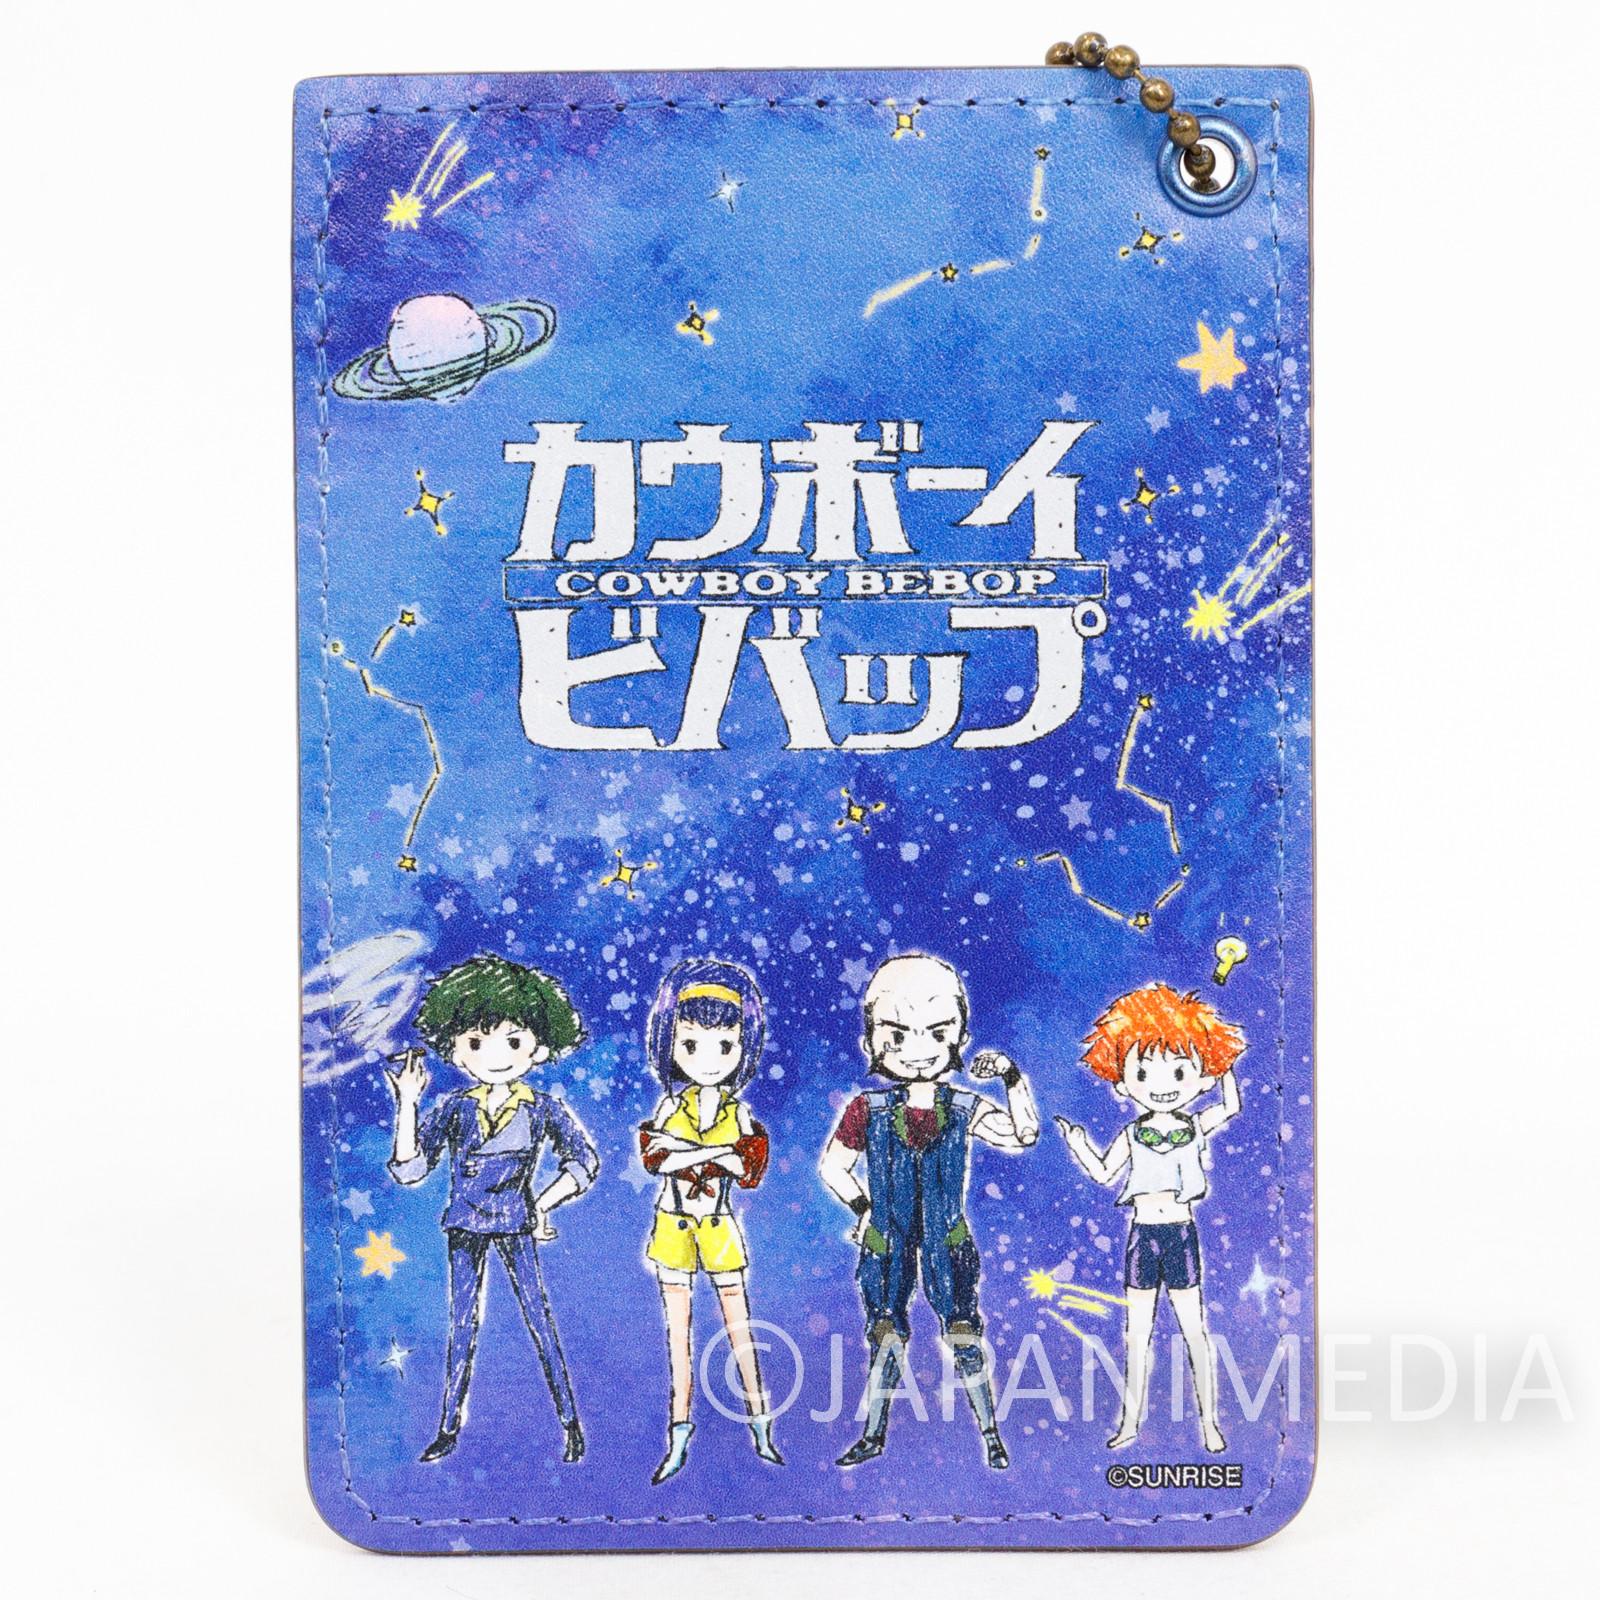 Cowboy Bebop Spike Jet Faye Ed Pass Card Case JAPAN ANIME